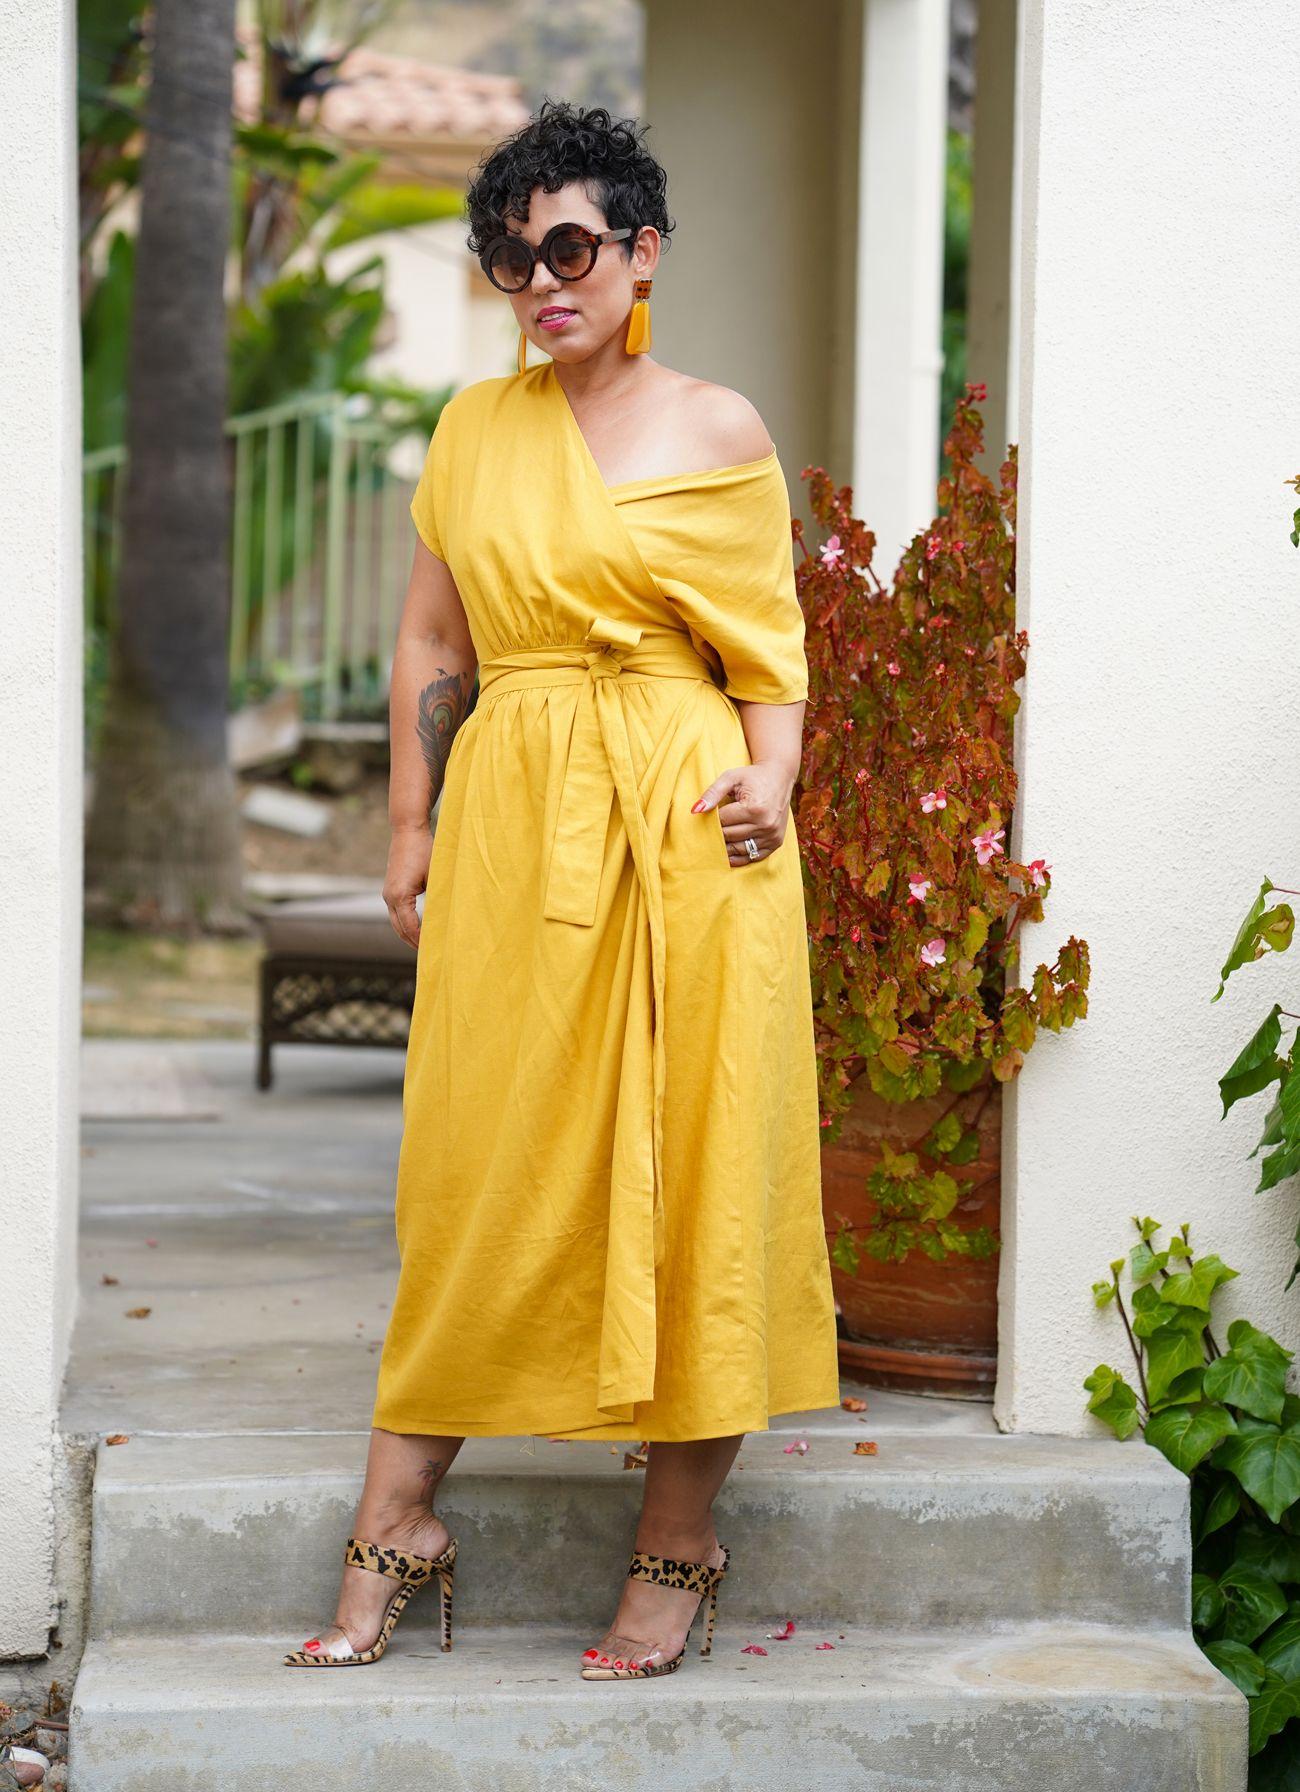 My Favorite Diy Self Drafted Wrap Dress Mimi G Style Wrap Dress Mimi G Dresses [ 1792 x 1300 Pixel ]